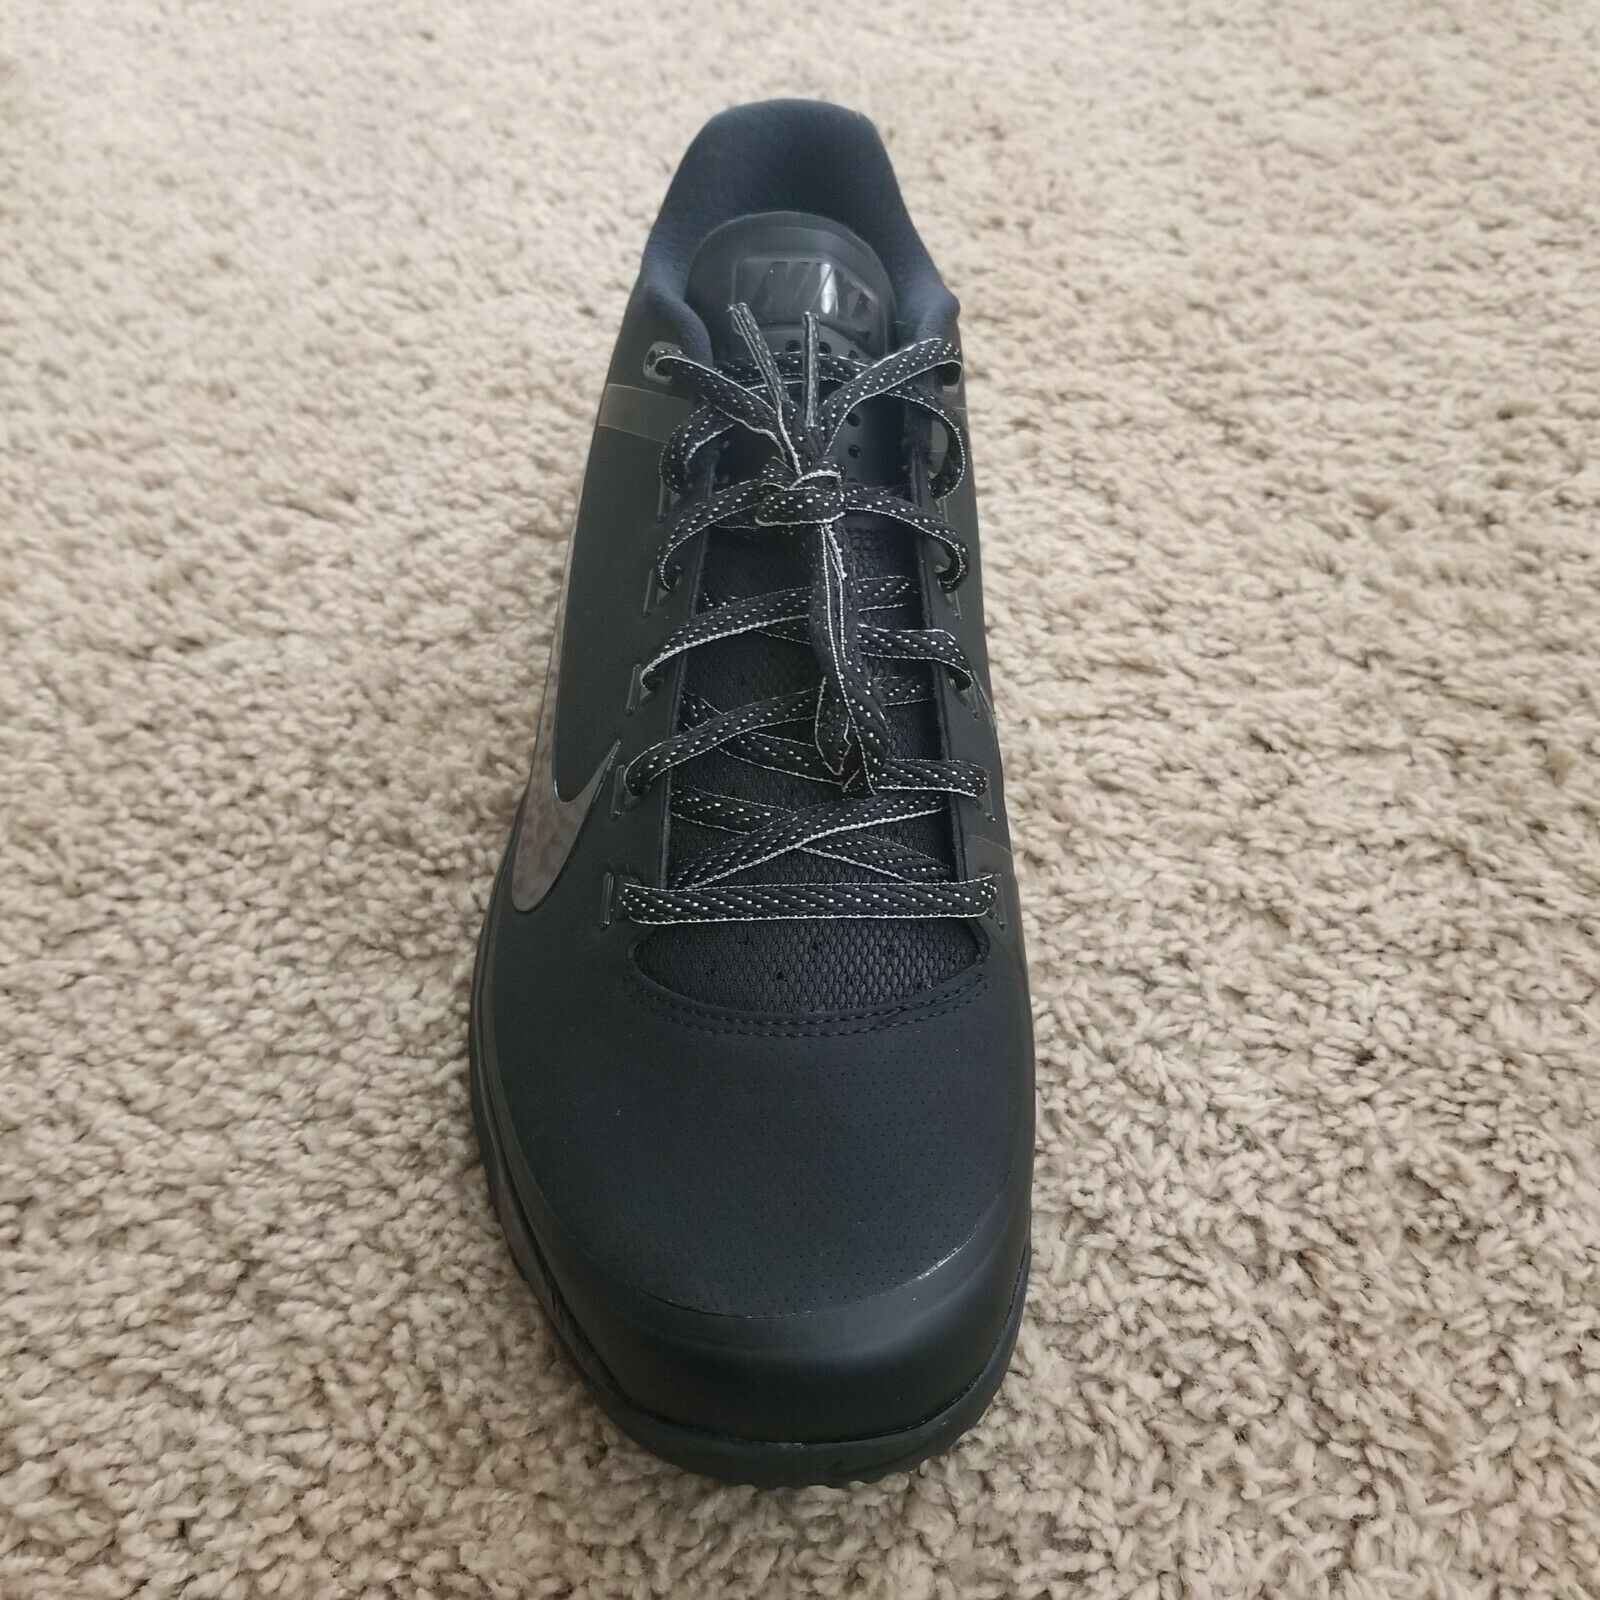 New Nike Lunar Clipper 17' Turf Baseball Trainers 880262 001 Mens Size